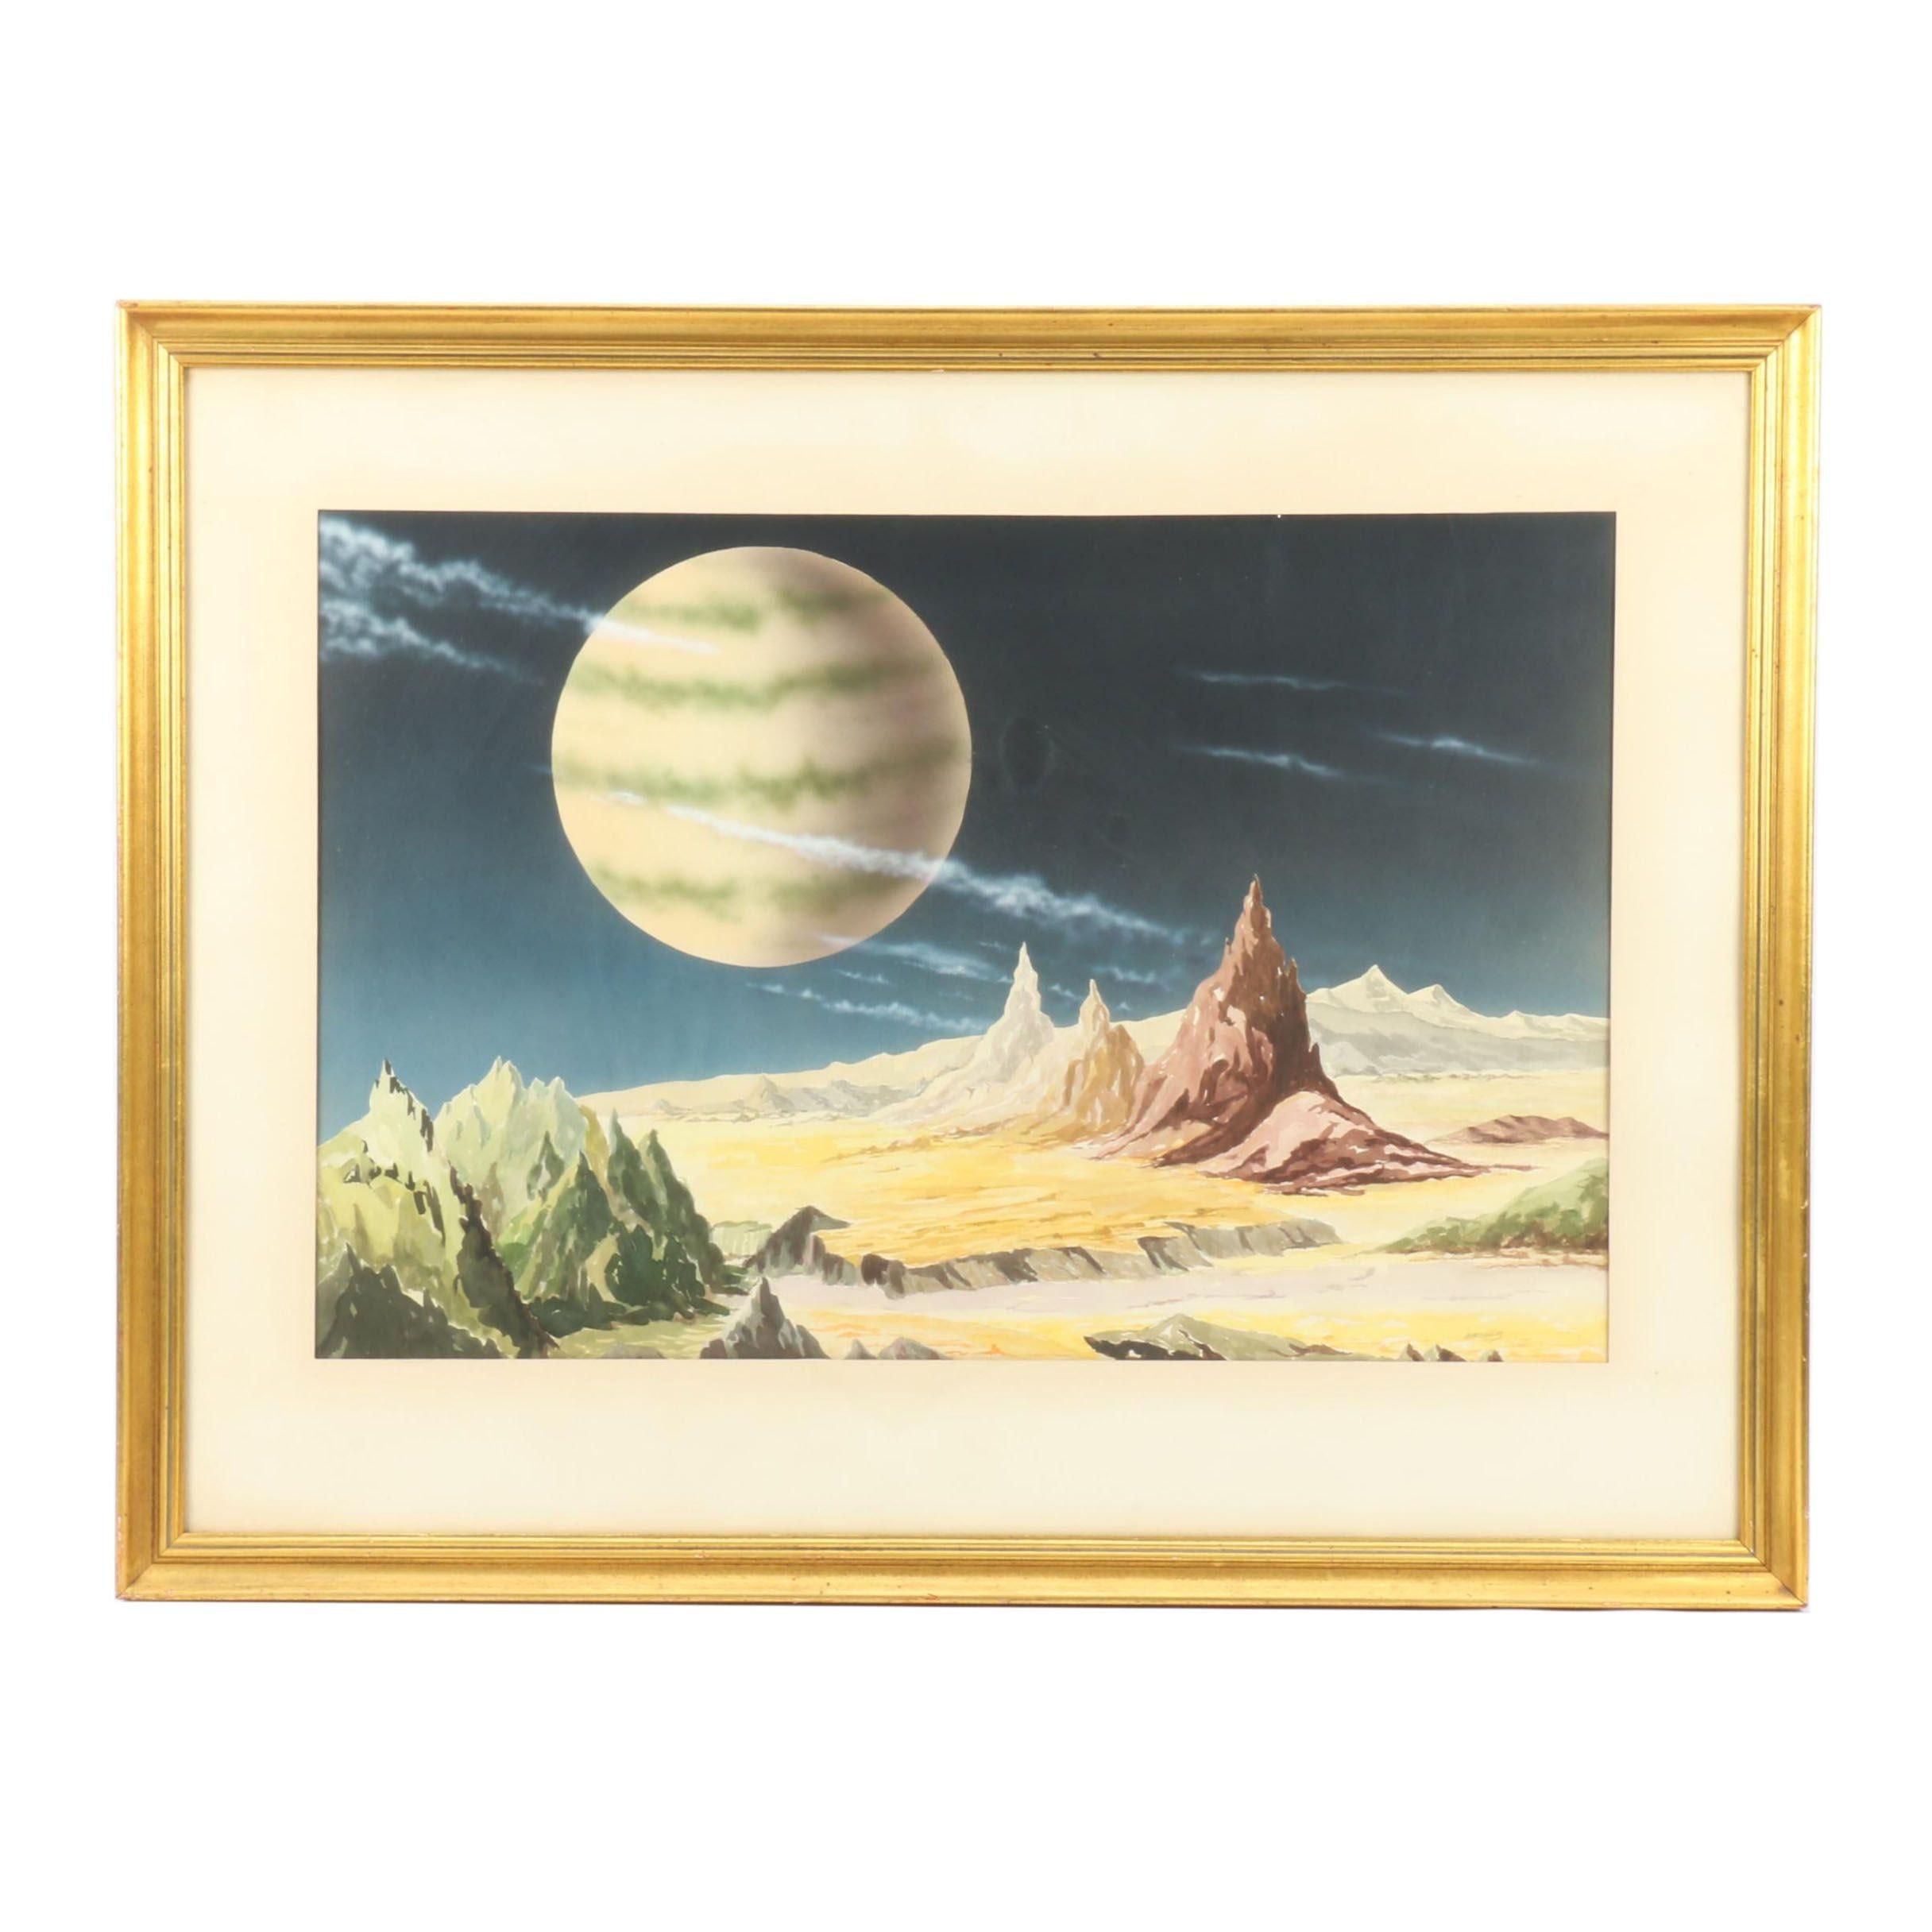 James Keller Watercolor Painting of Surreal Landscape